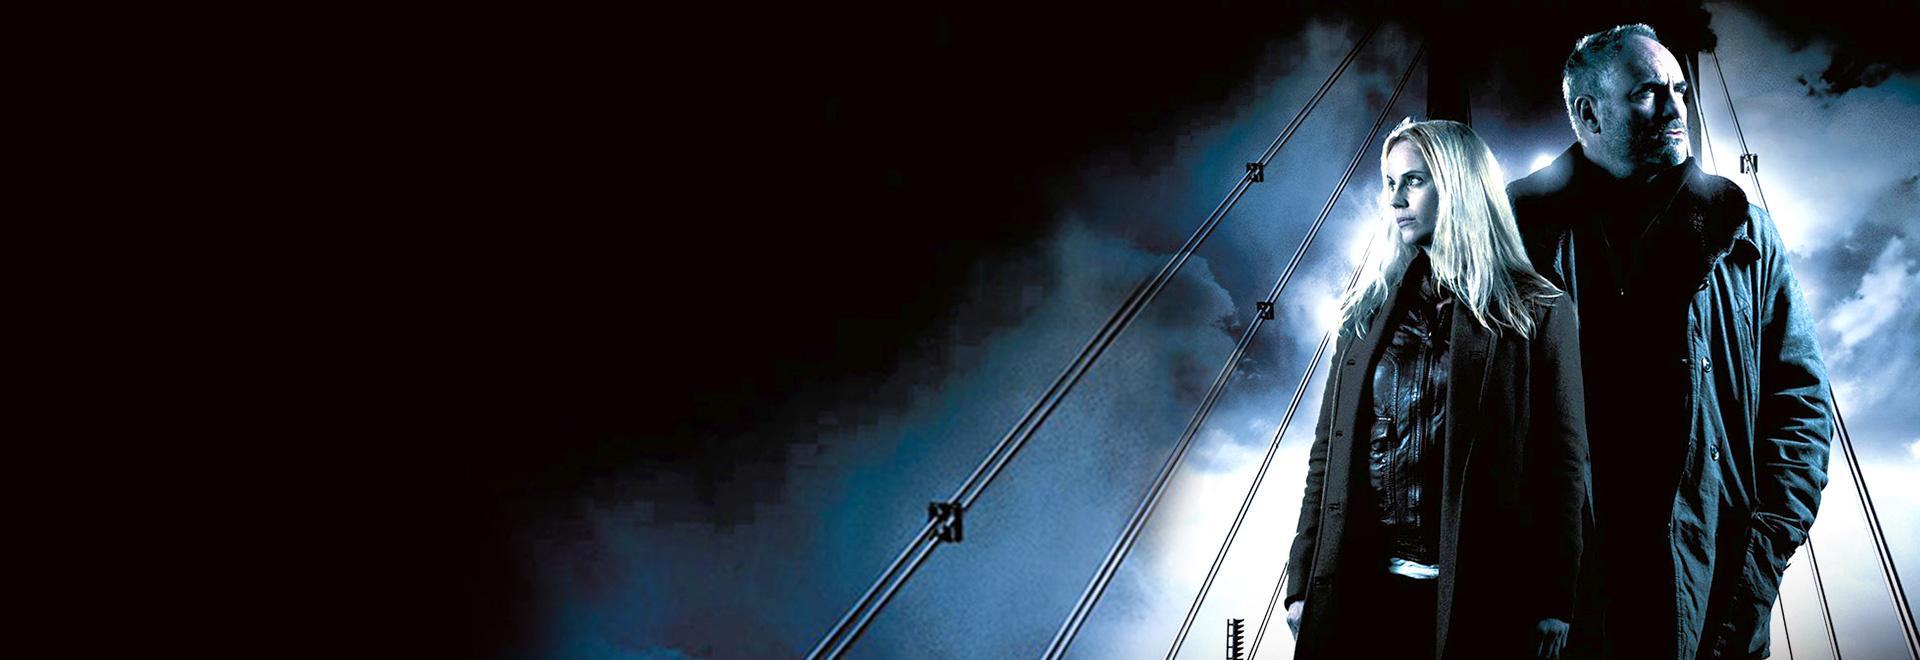 The Bridge - La serie originale